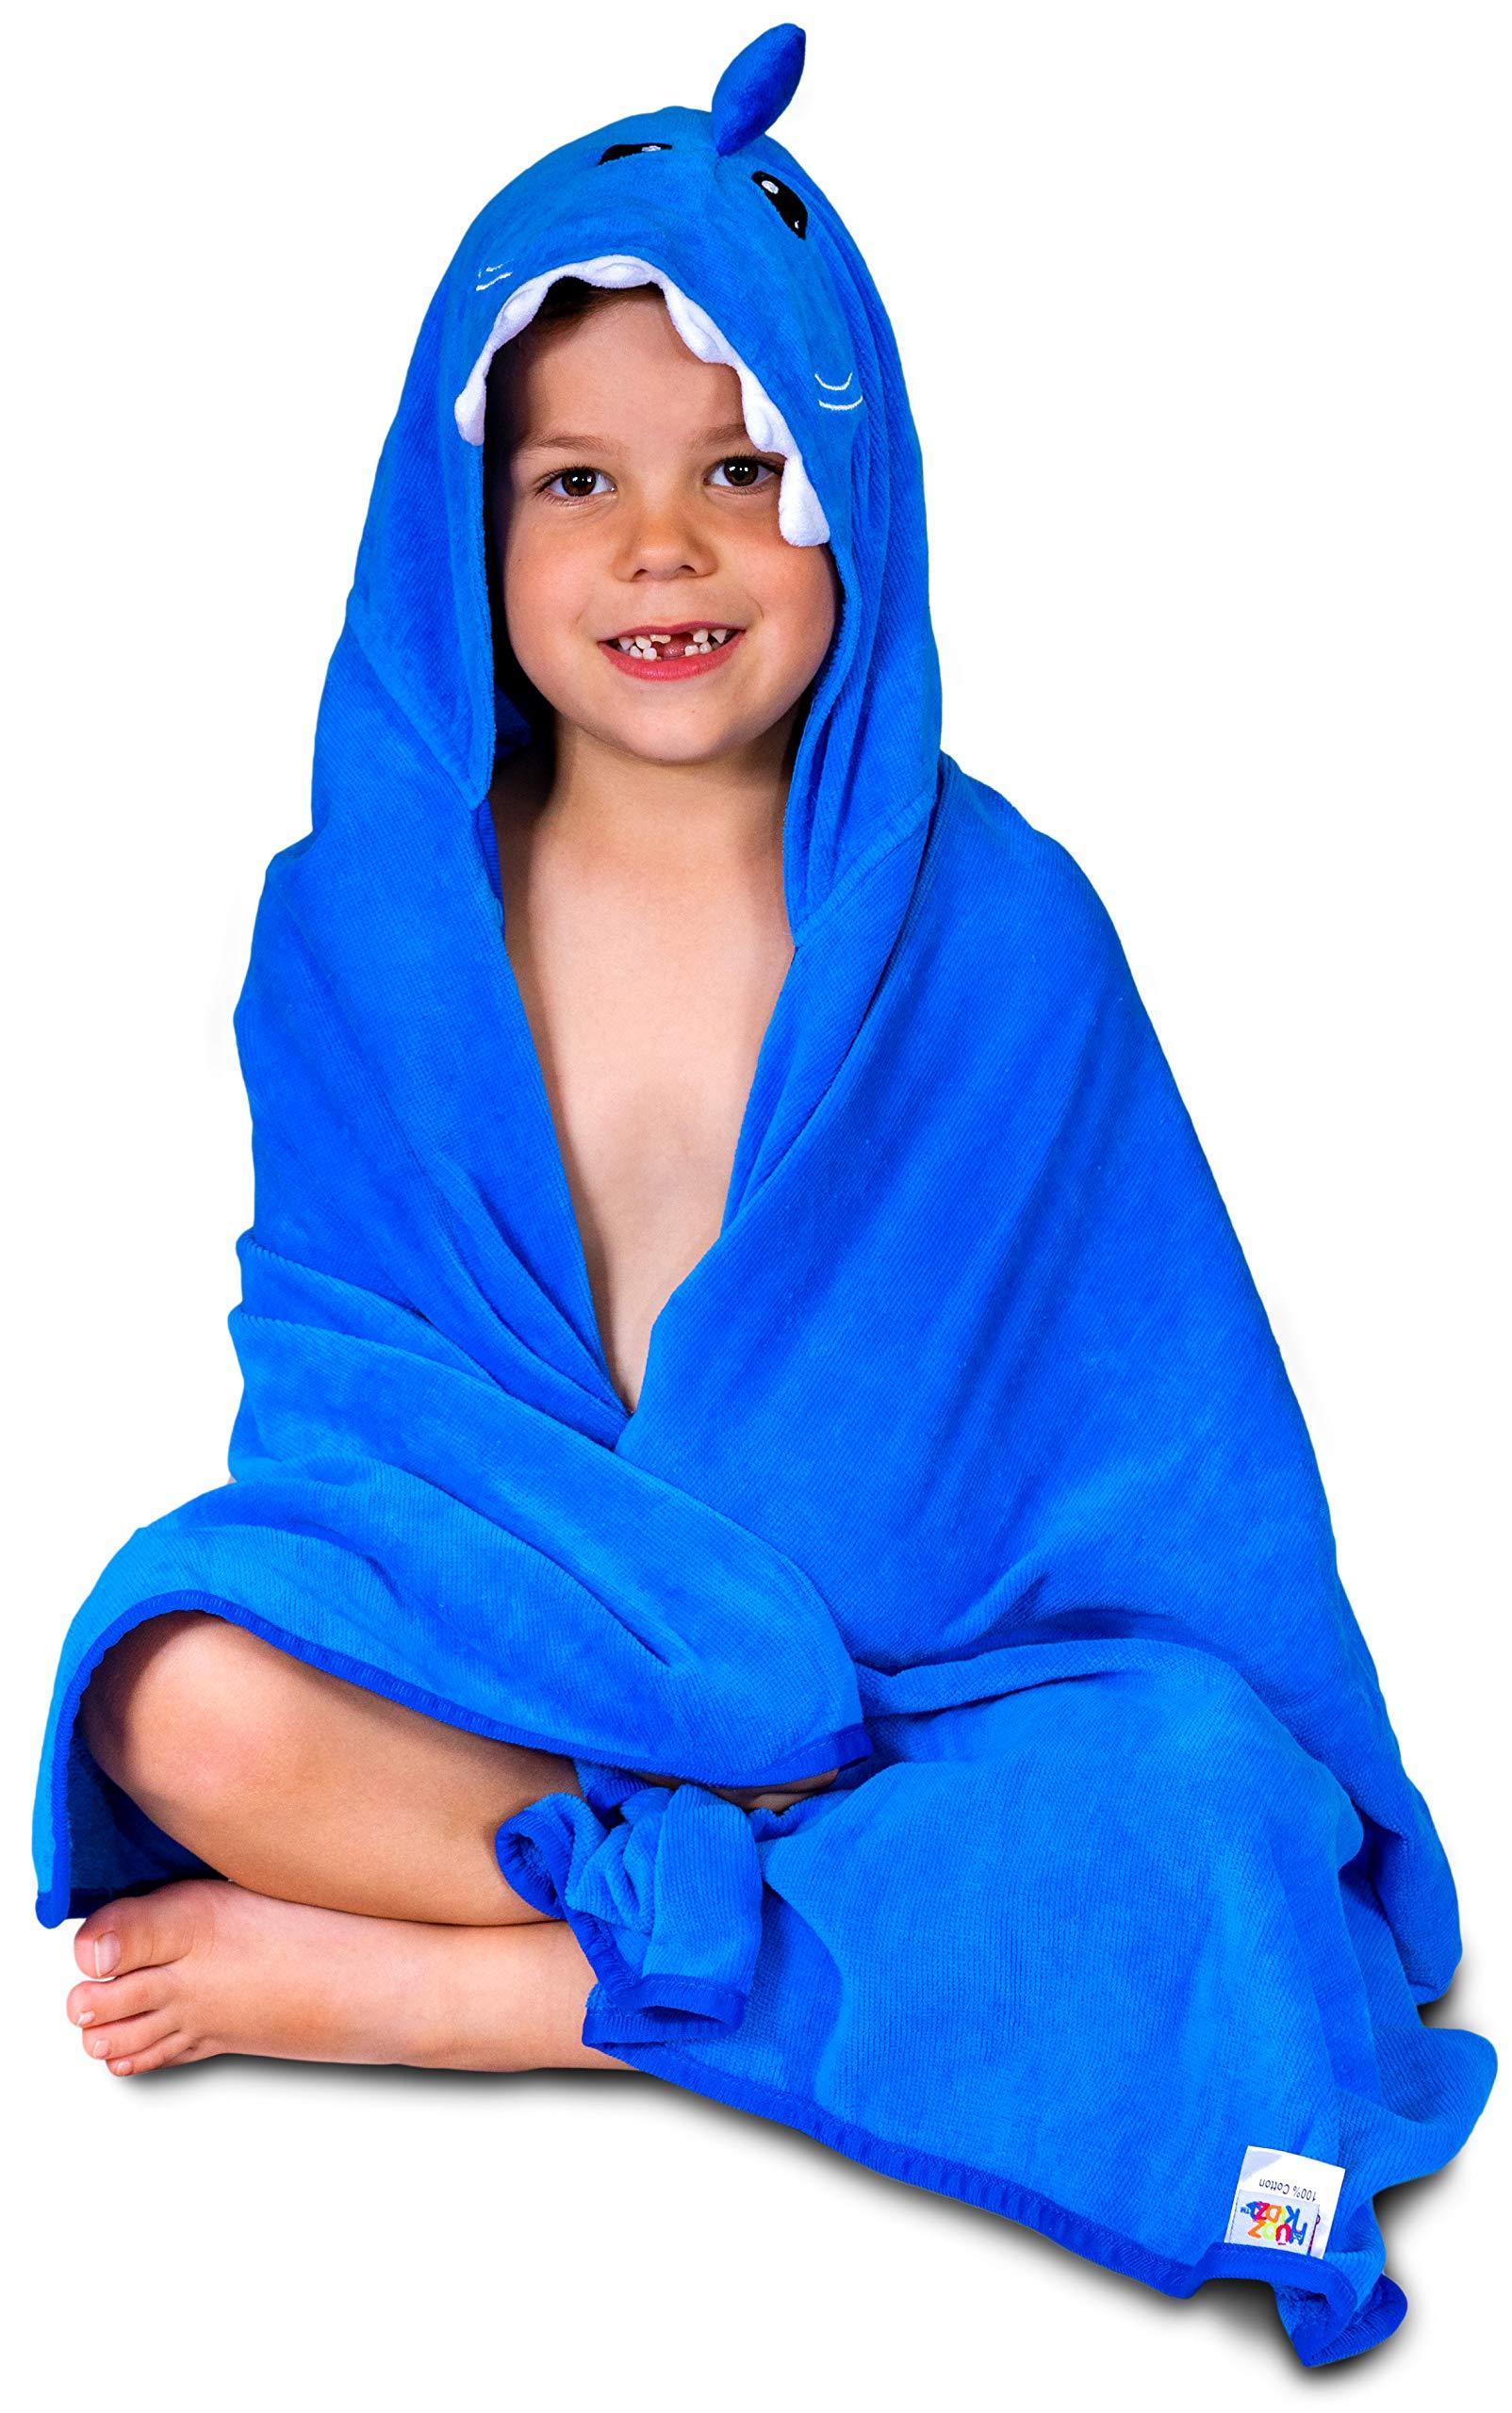 Hudz Kidz Hooded Towel for Kids & Toddlers, Ideal at Bath, Beach, Pool by Hudz Kidz (Image #5)